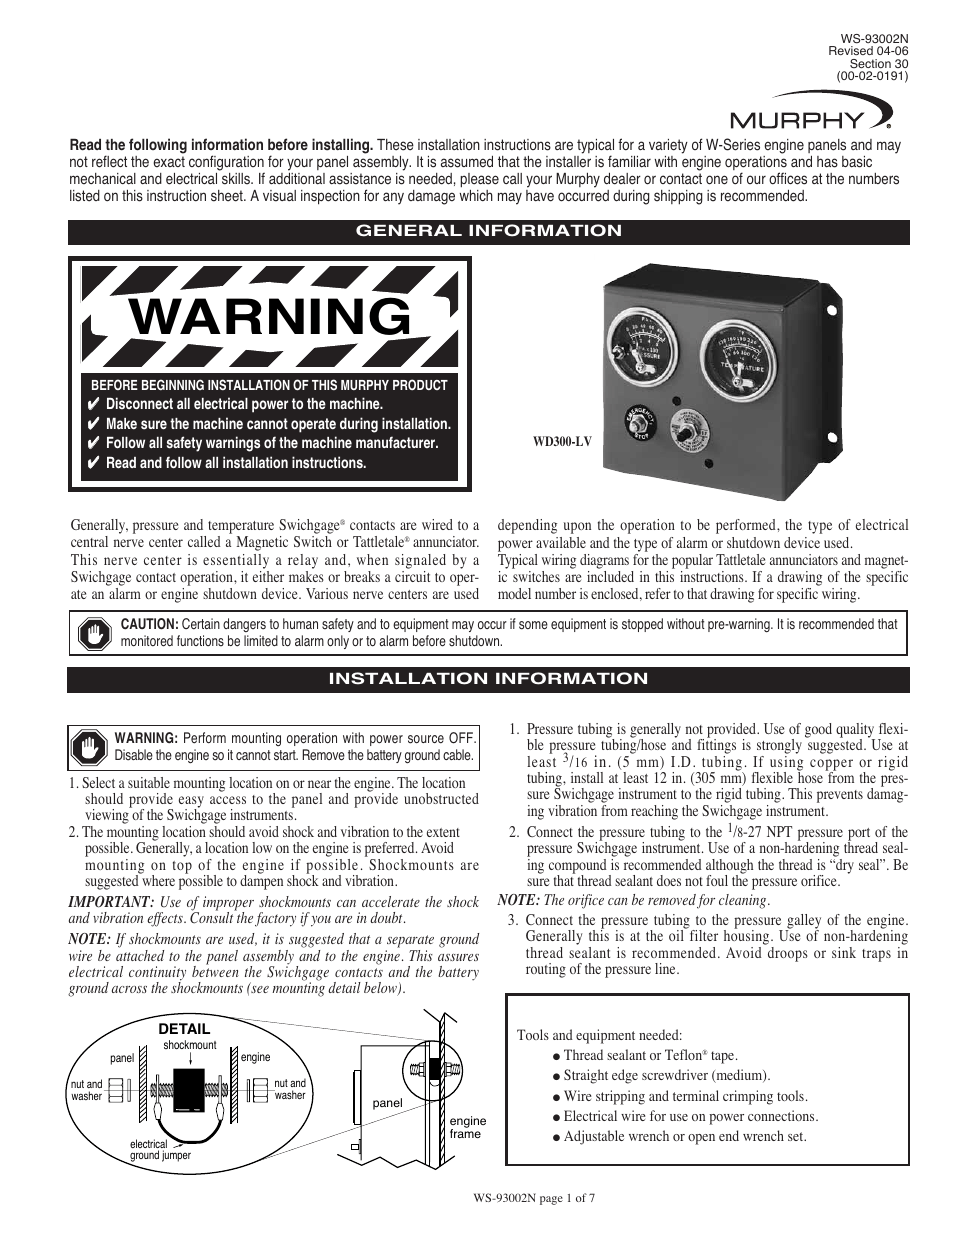 medium resolution of wiring audio equipment drawing